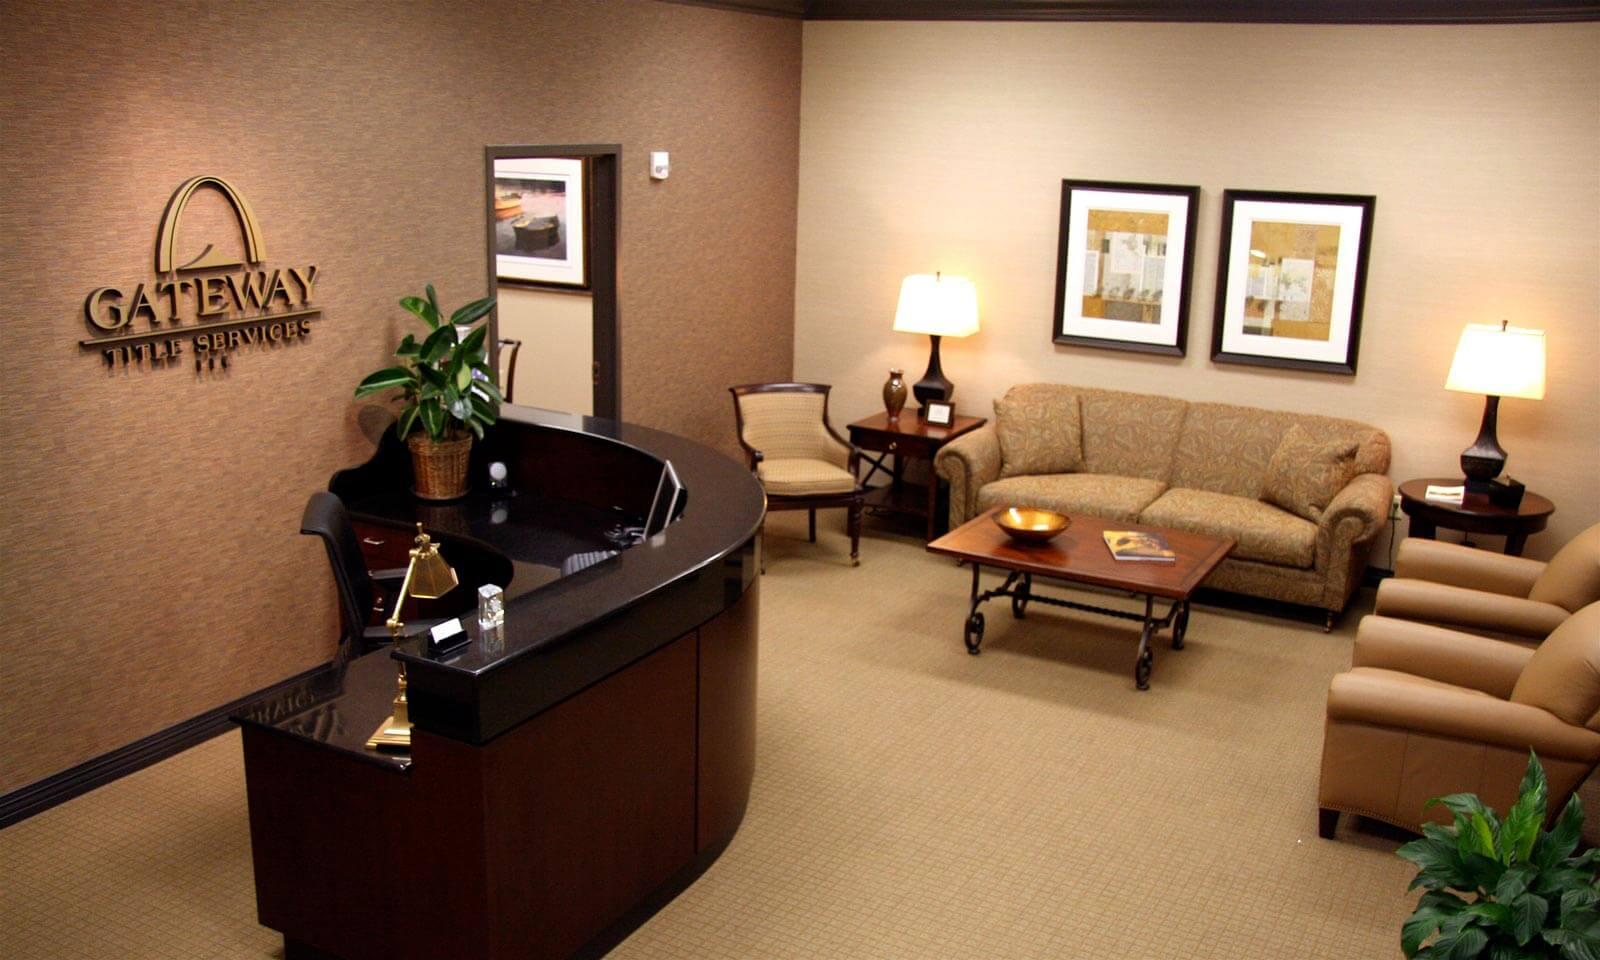 gateway title office reception desk logo chairs